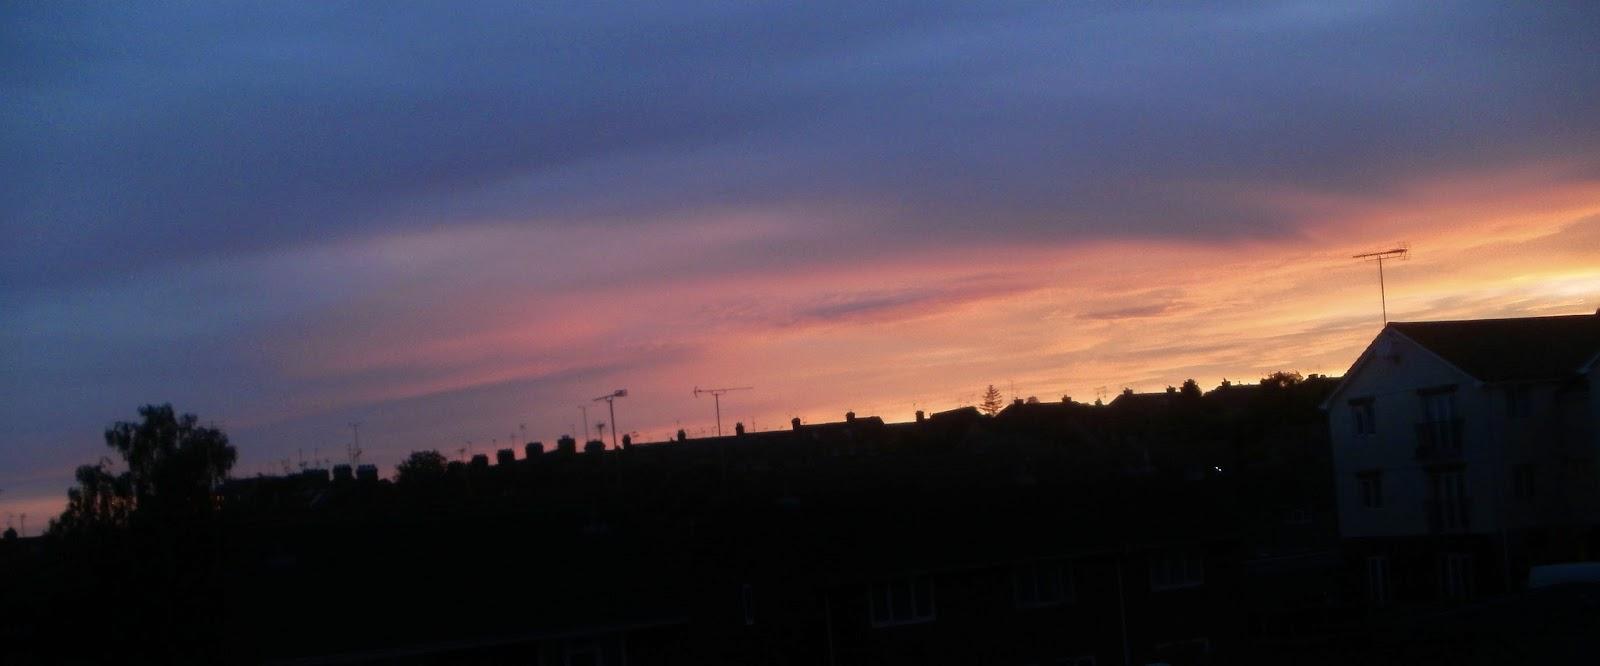 sunset, silhouette